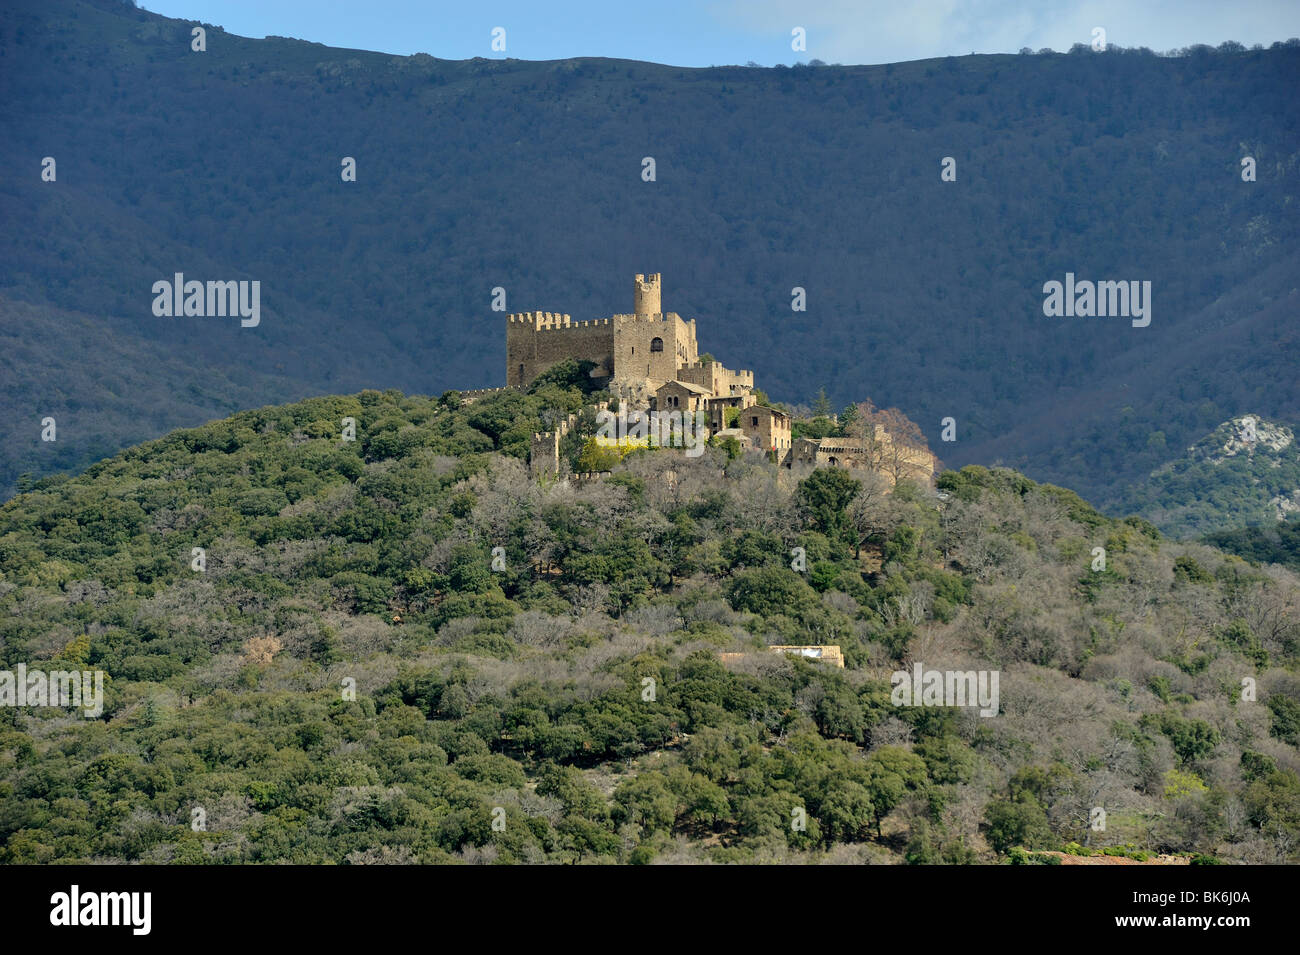 castle of Recasens, La Jonquera, Alt Empordà, Girona, Spain Stock Photo